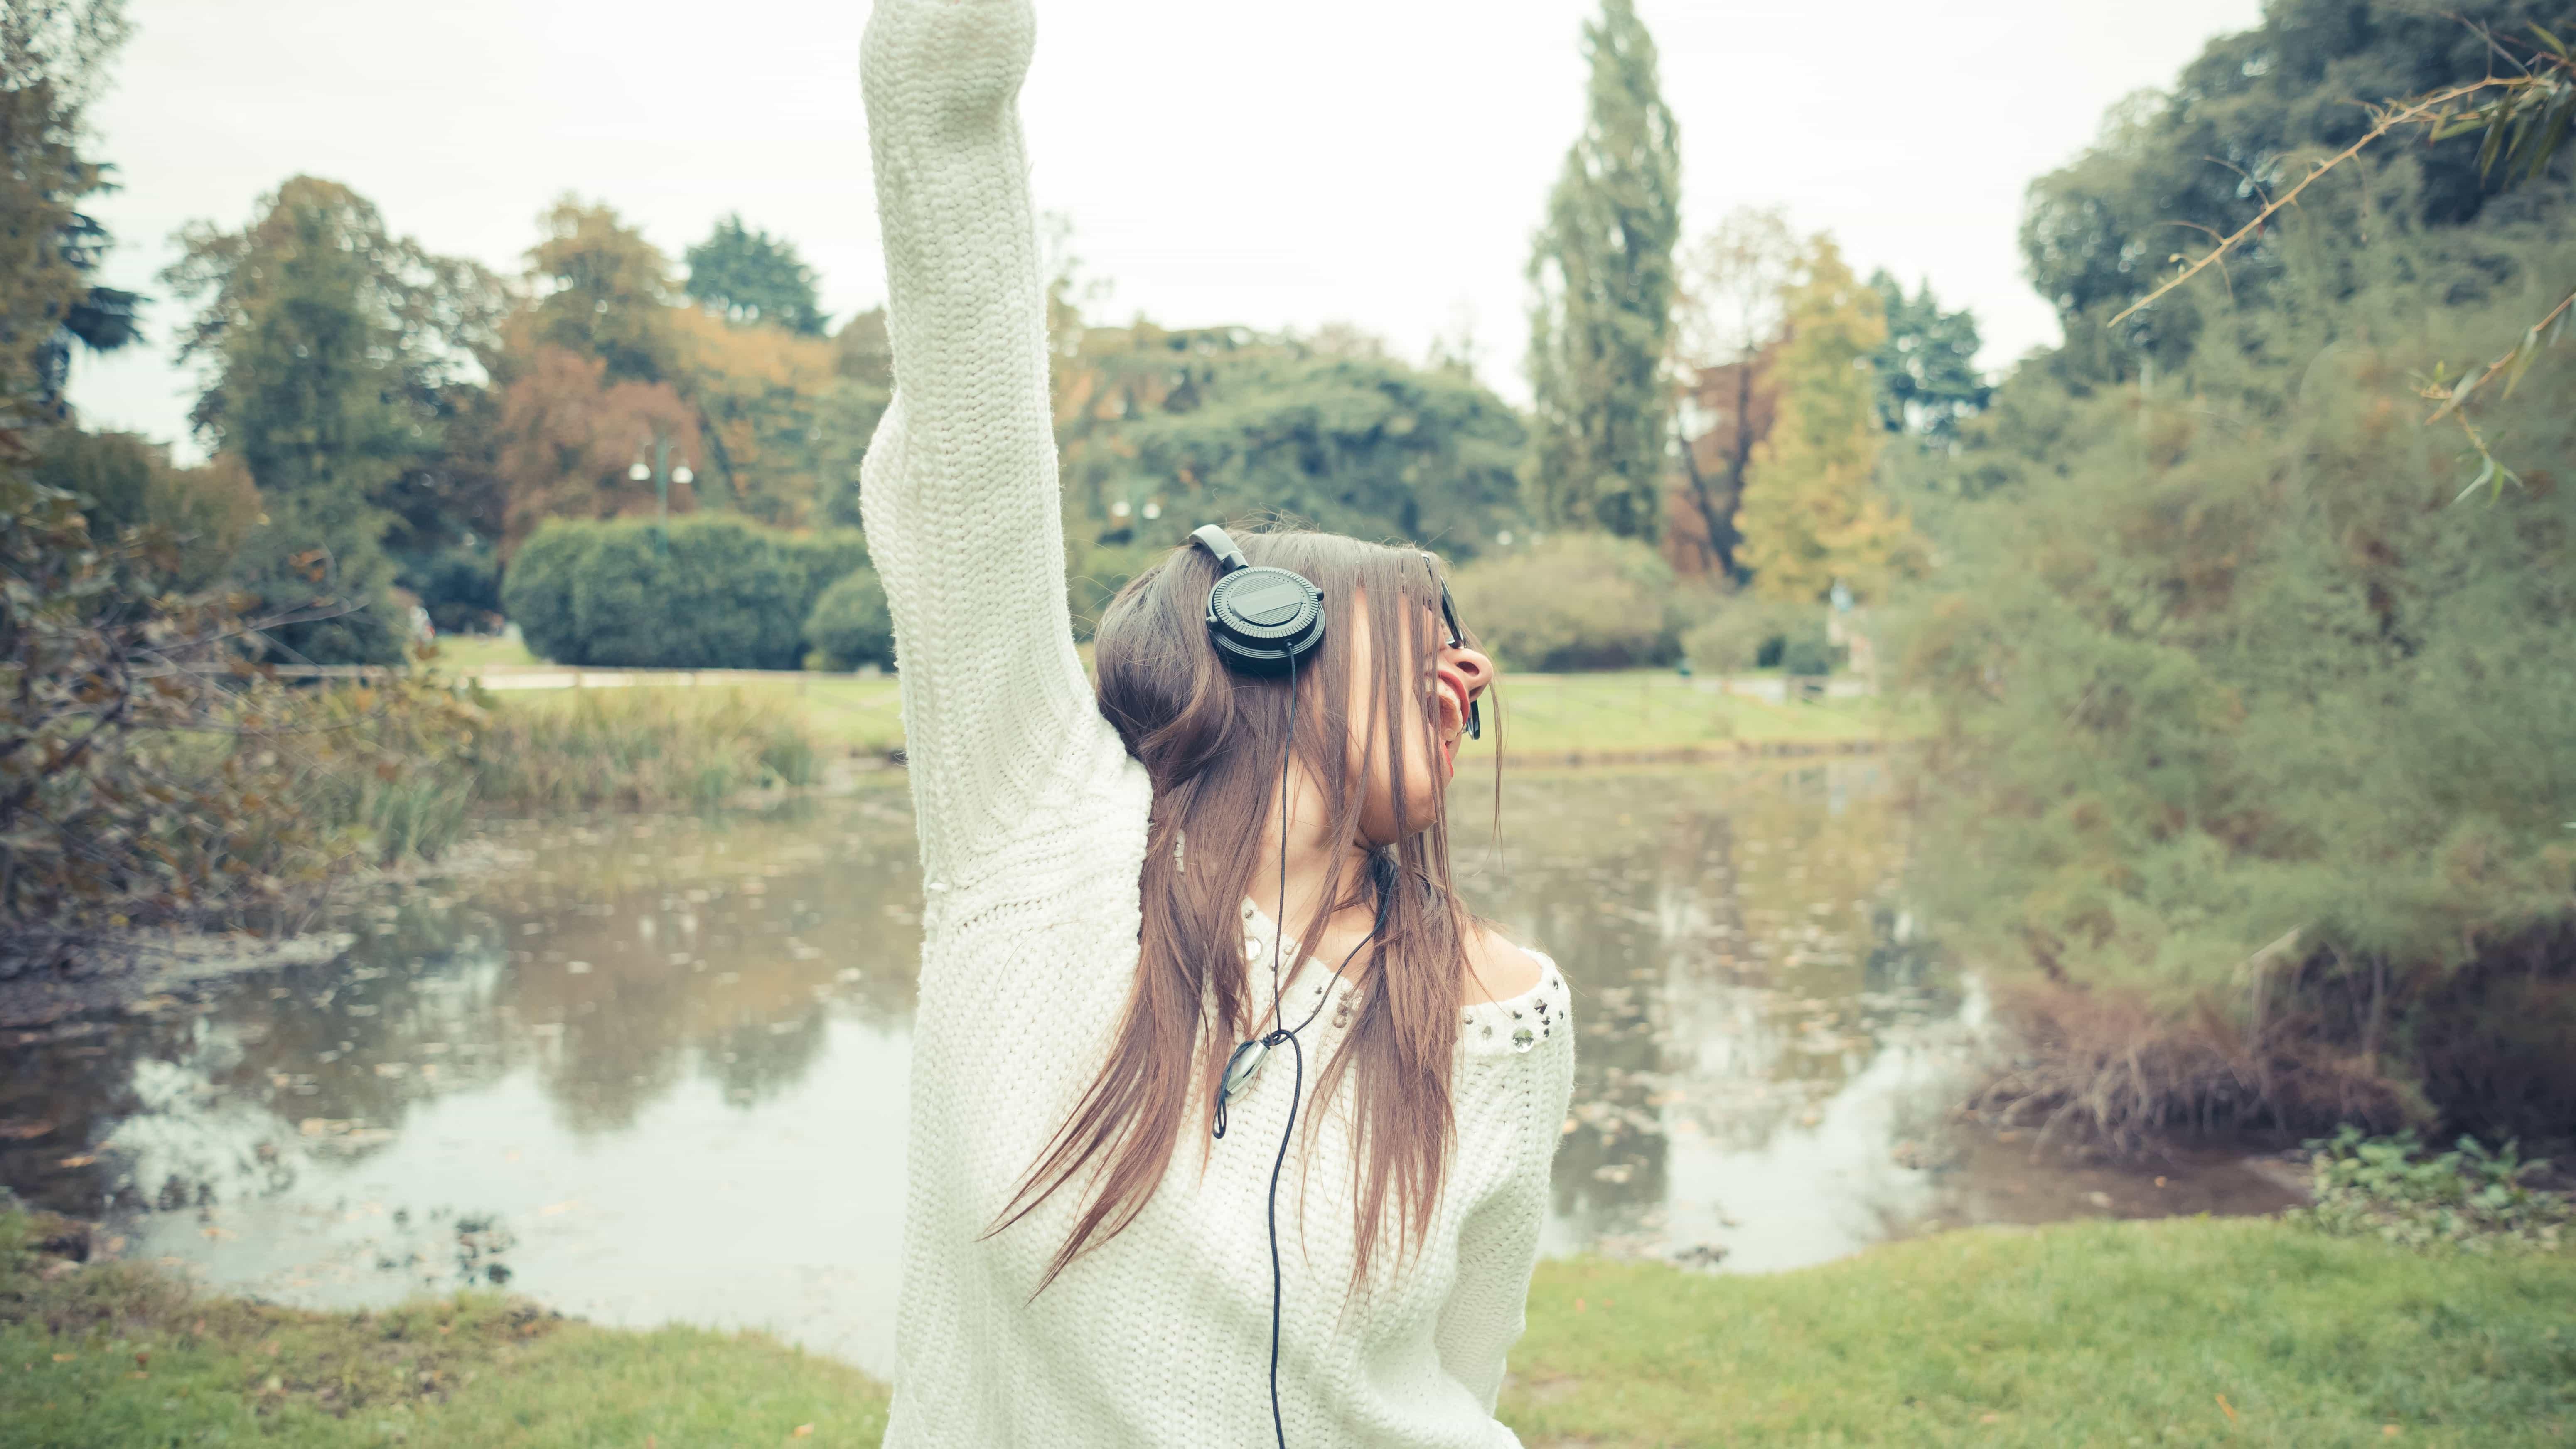 4 Brilliant Ways To Unlock Your Voice's True Potential